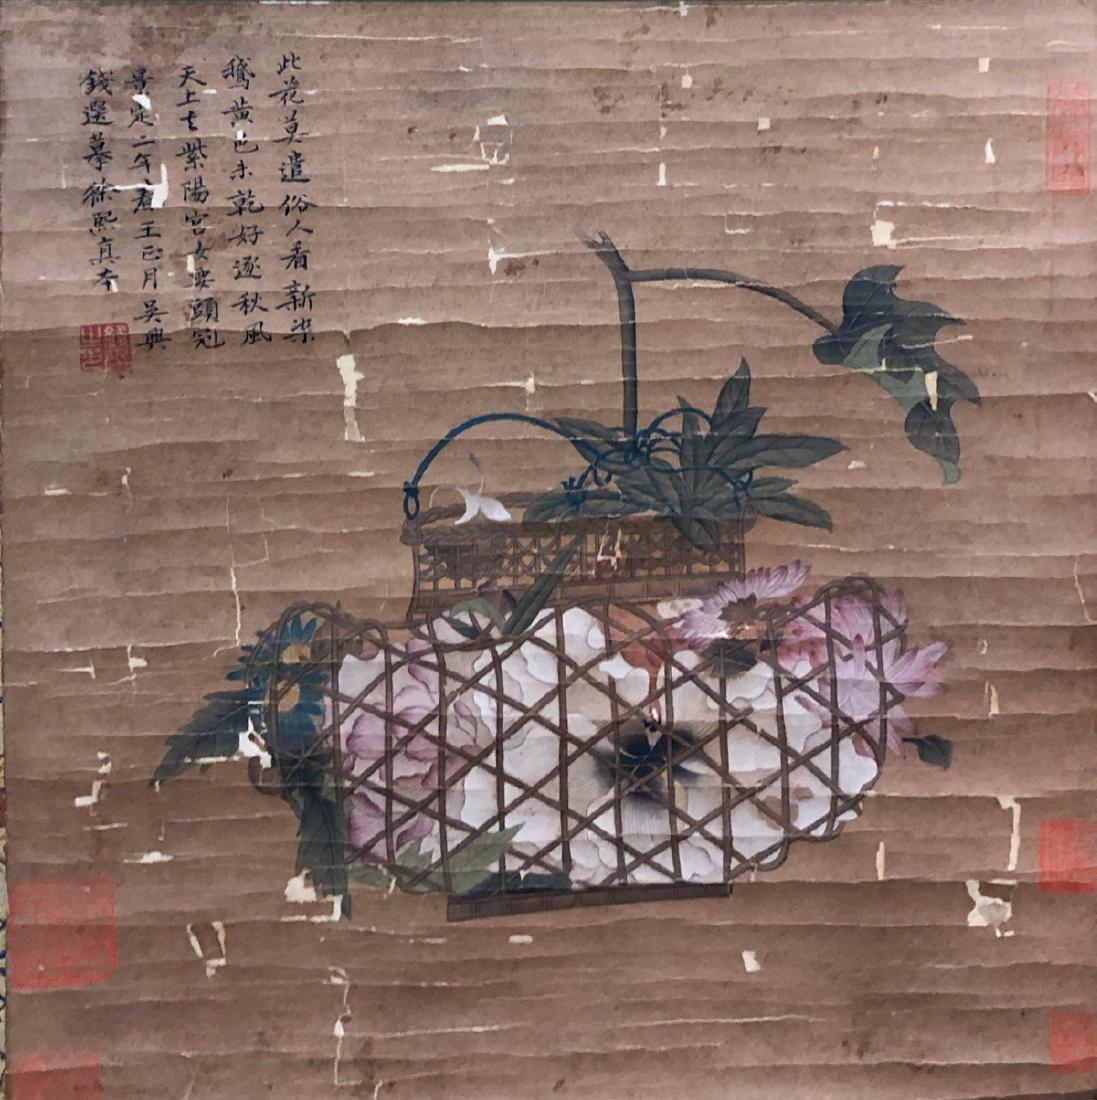 9TH CENTURY, XI XU   PAINTING, SOUTHERN TANG - 2